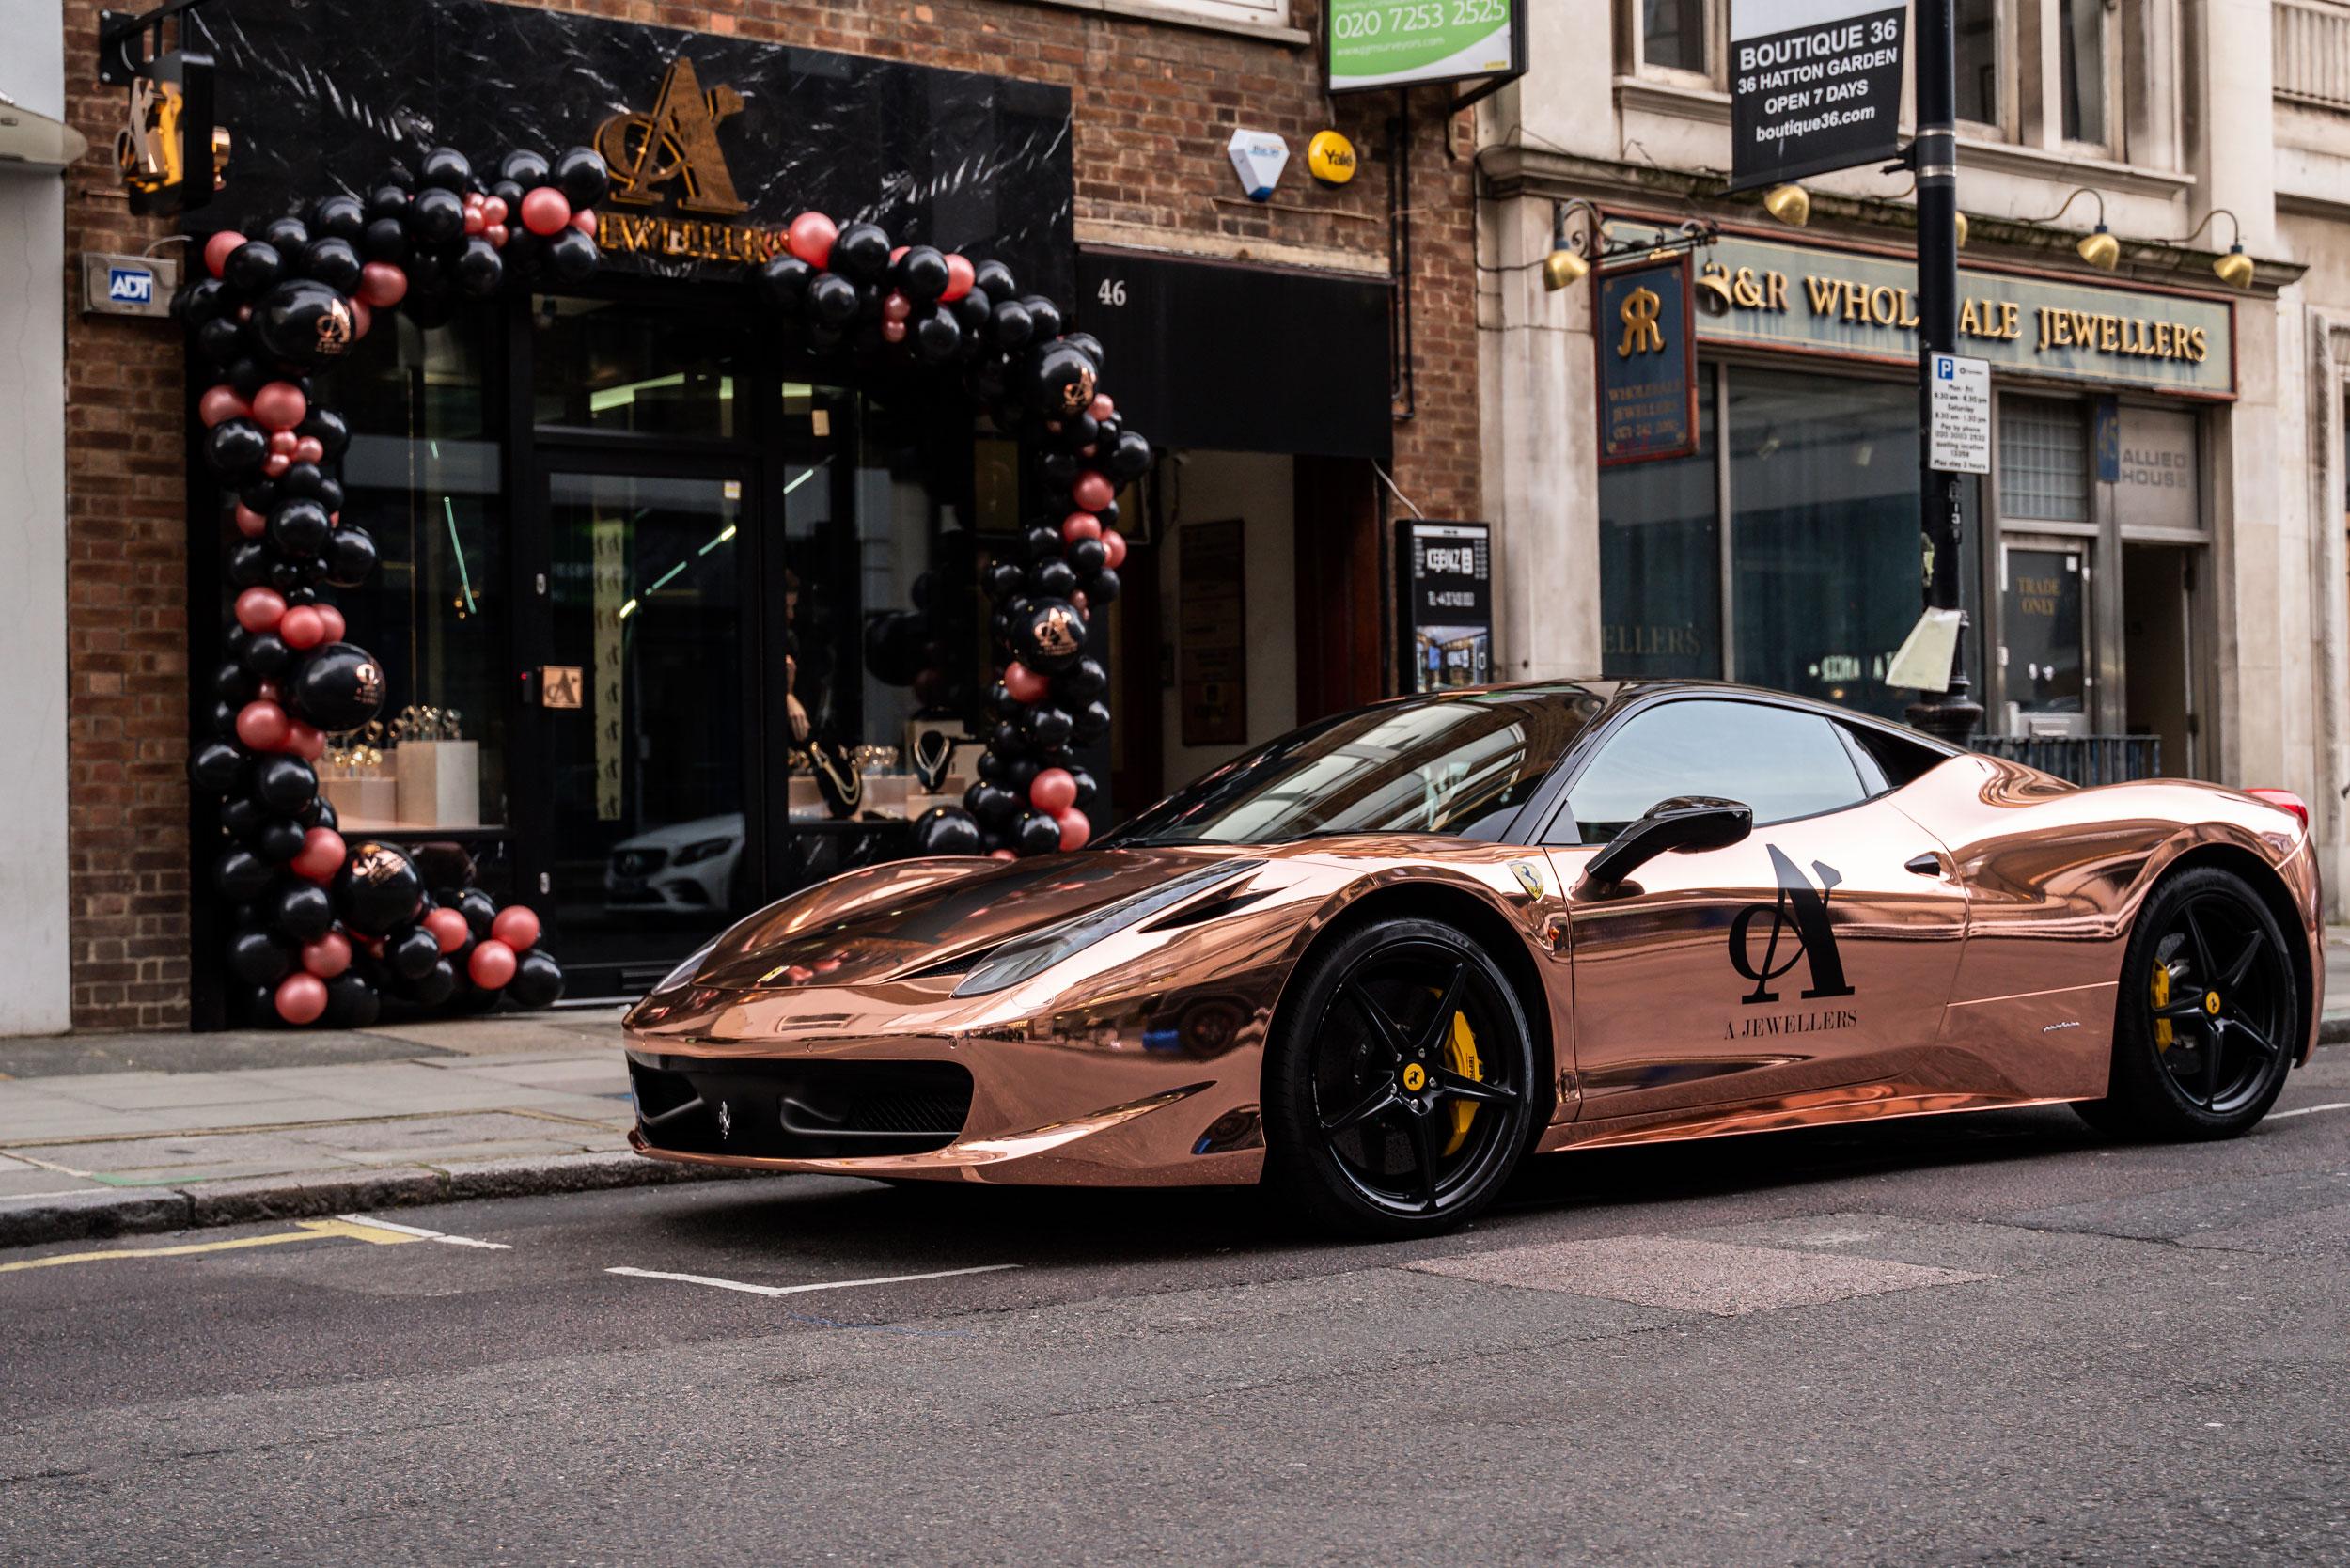 A-Jewellers-Opening-Ferrari-1